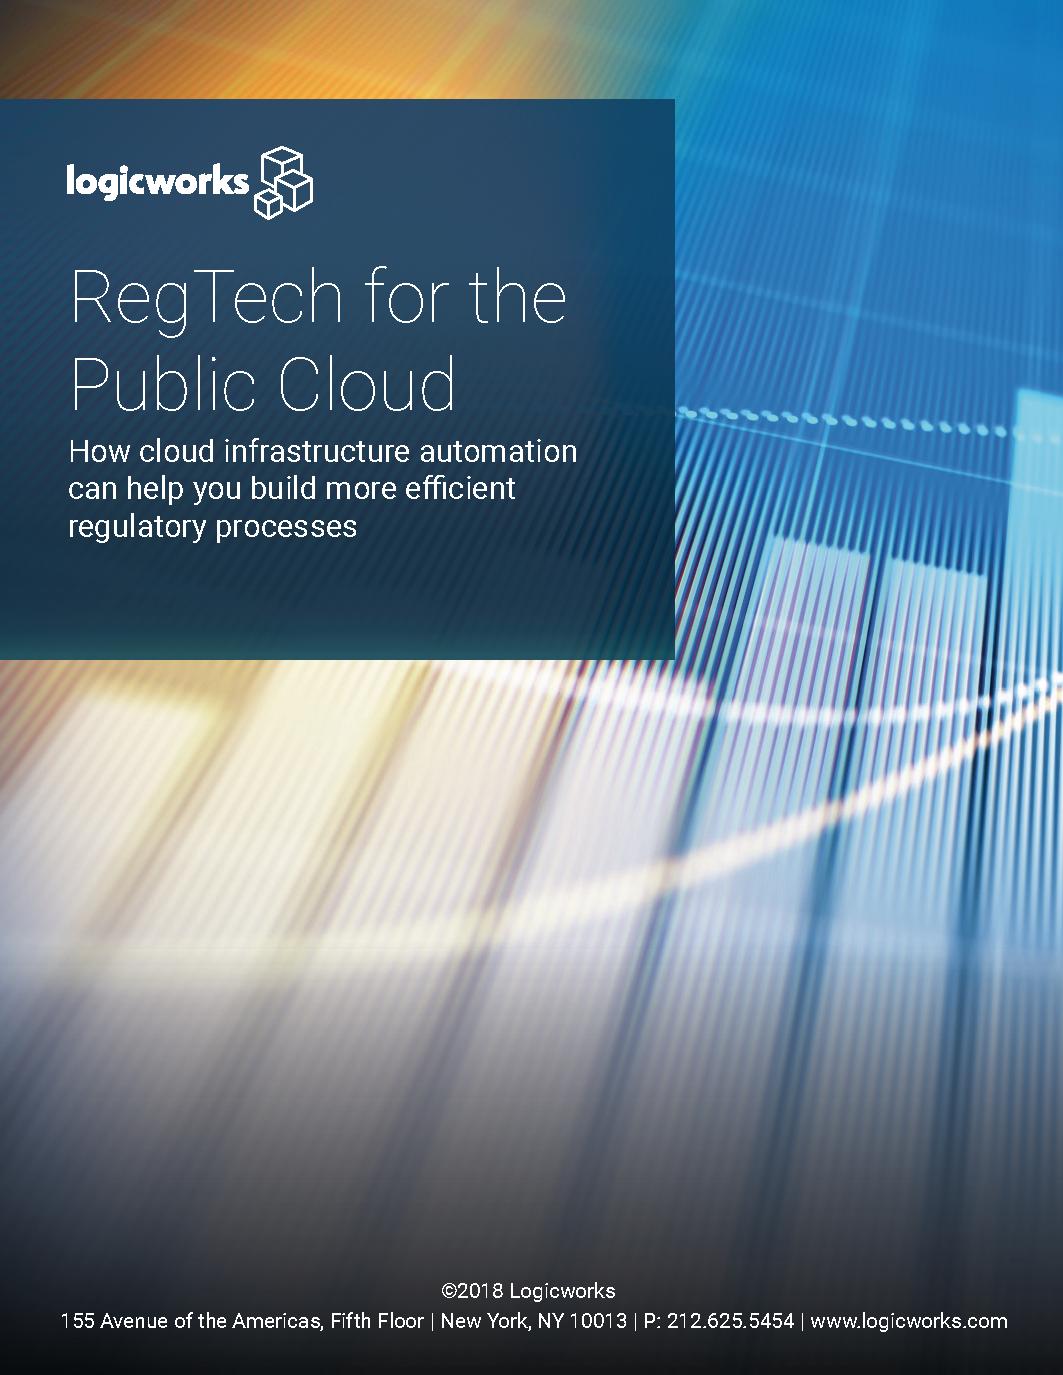 Logicworks eBook - RegTech for the Public Cloud